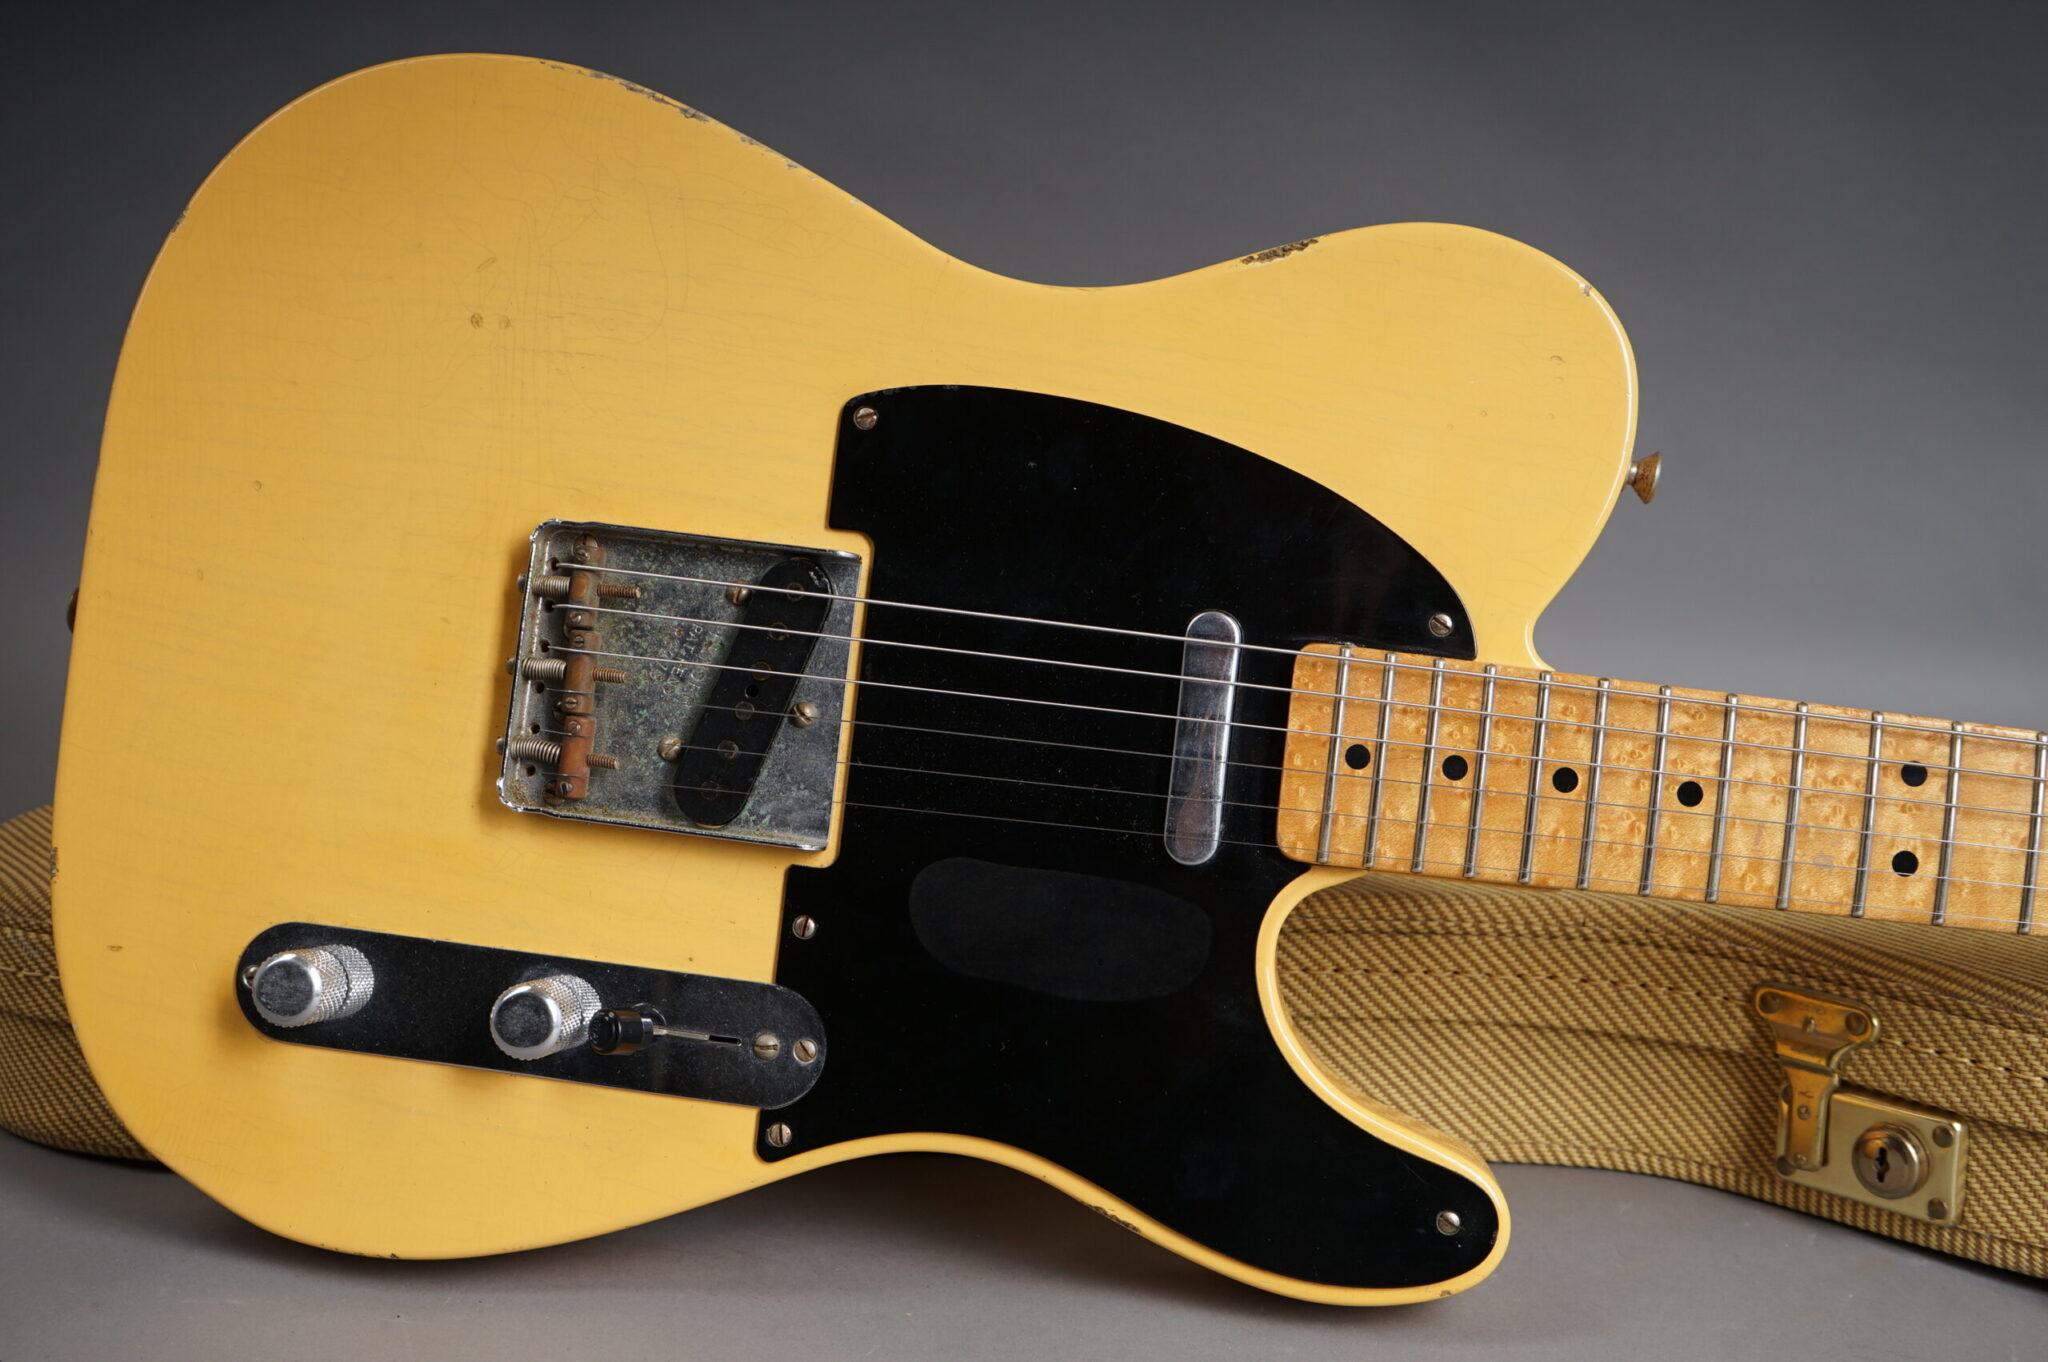 https://guitarpoint.de/app/uploads/products/2002-fender-custom-shop-1951-nocaster-telecaster-reissue-relic-butterscotch/2002-Fender-51-Nocaster-Blond-R3279-8-scaled-2048x1362.jpg